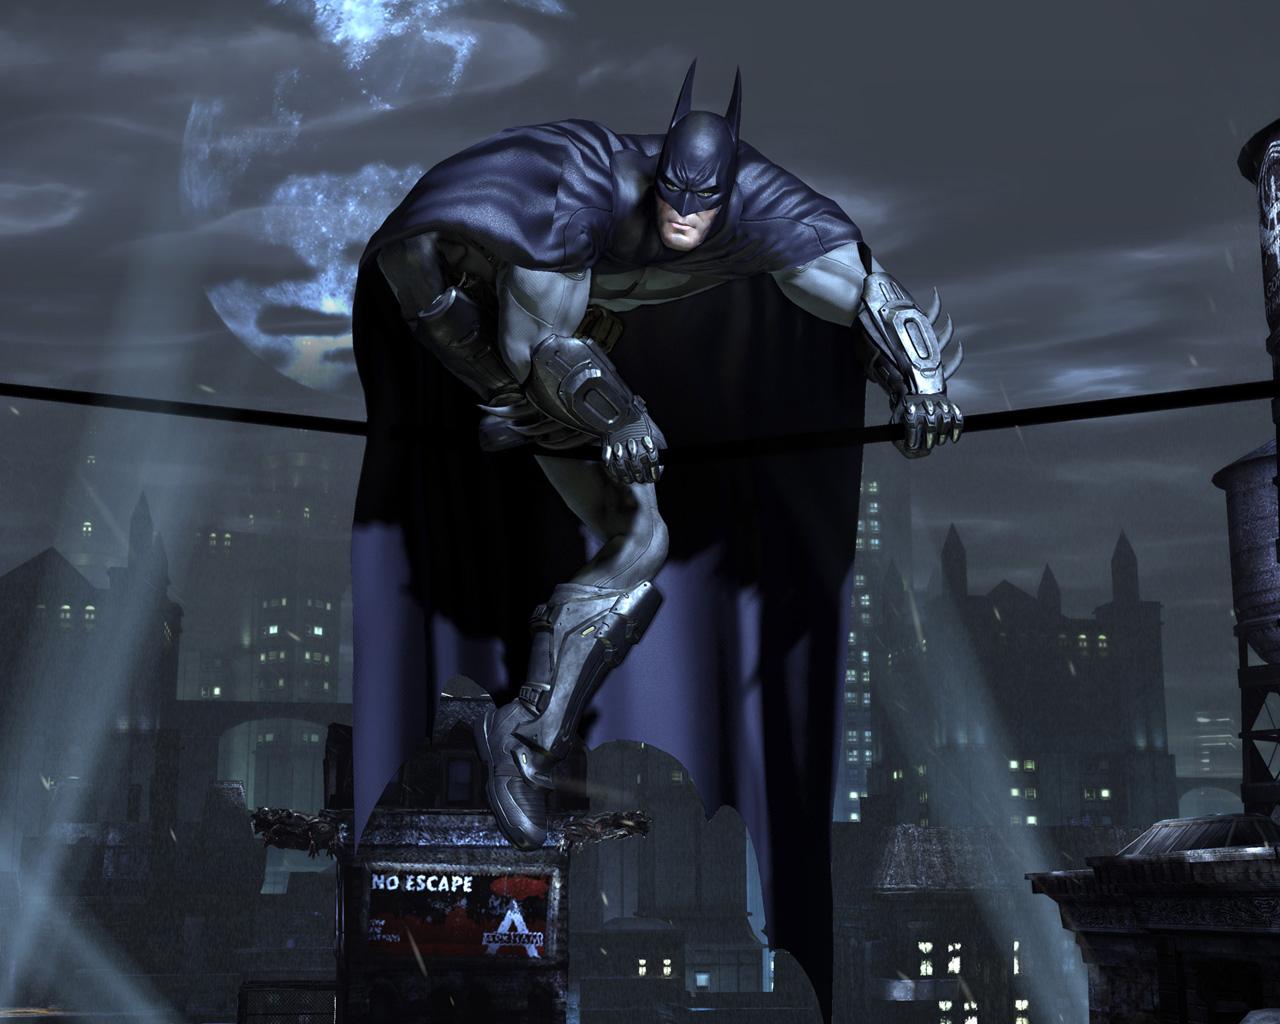 Free Batman: Arkham City Wallpaper in 1280x1024